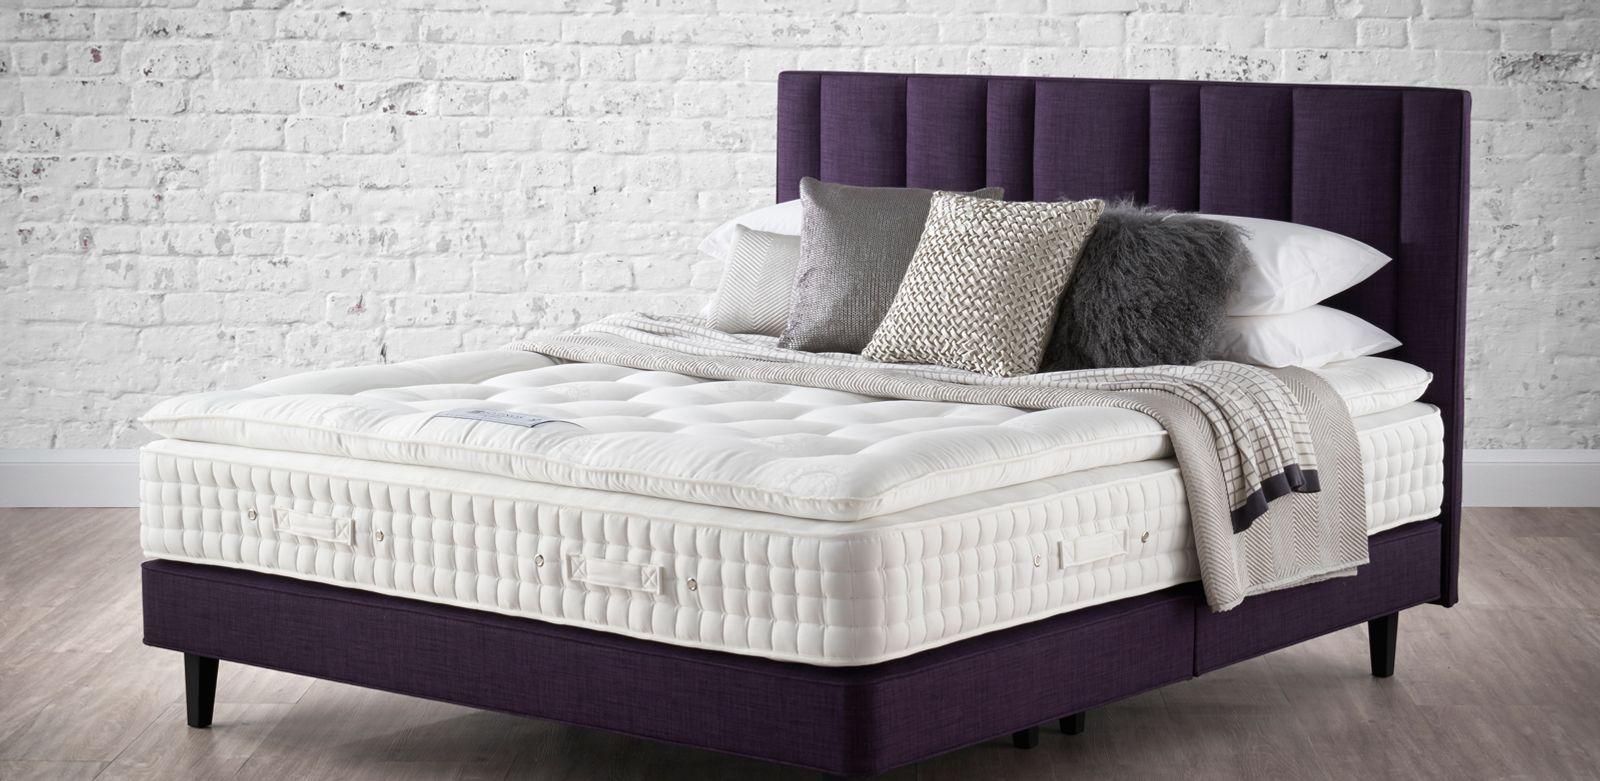 pillow top celestial hypnos beds